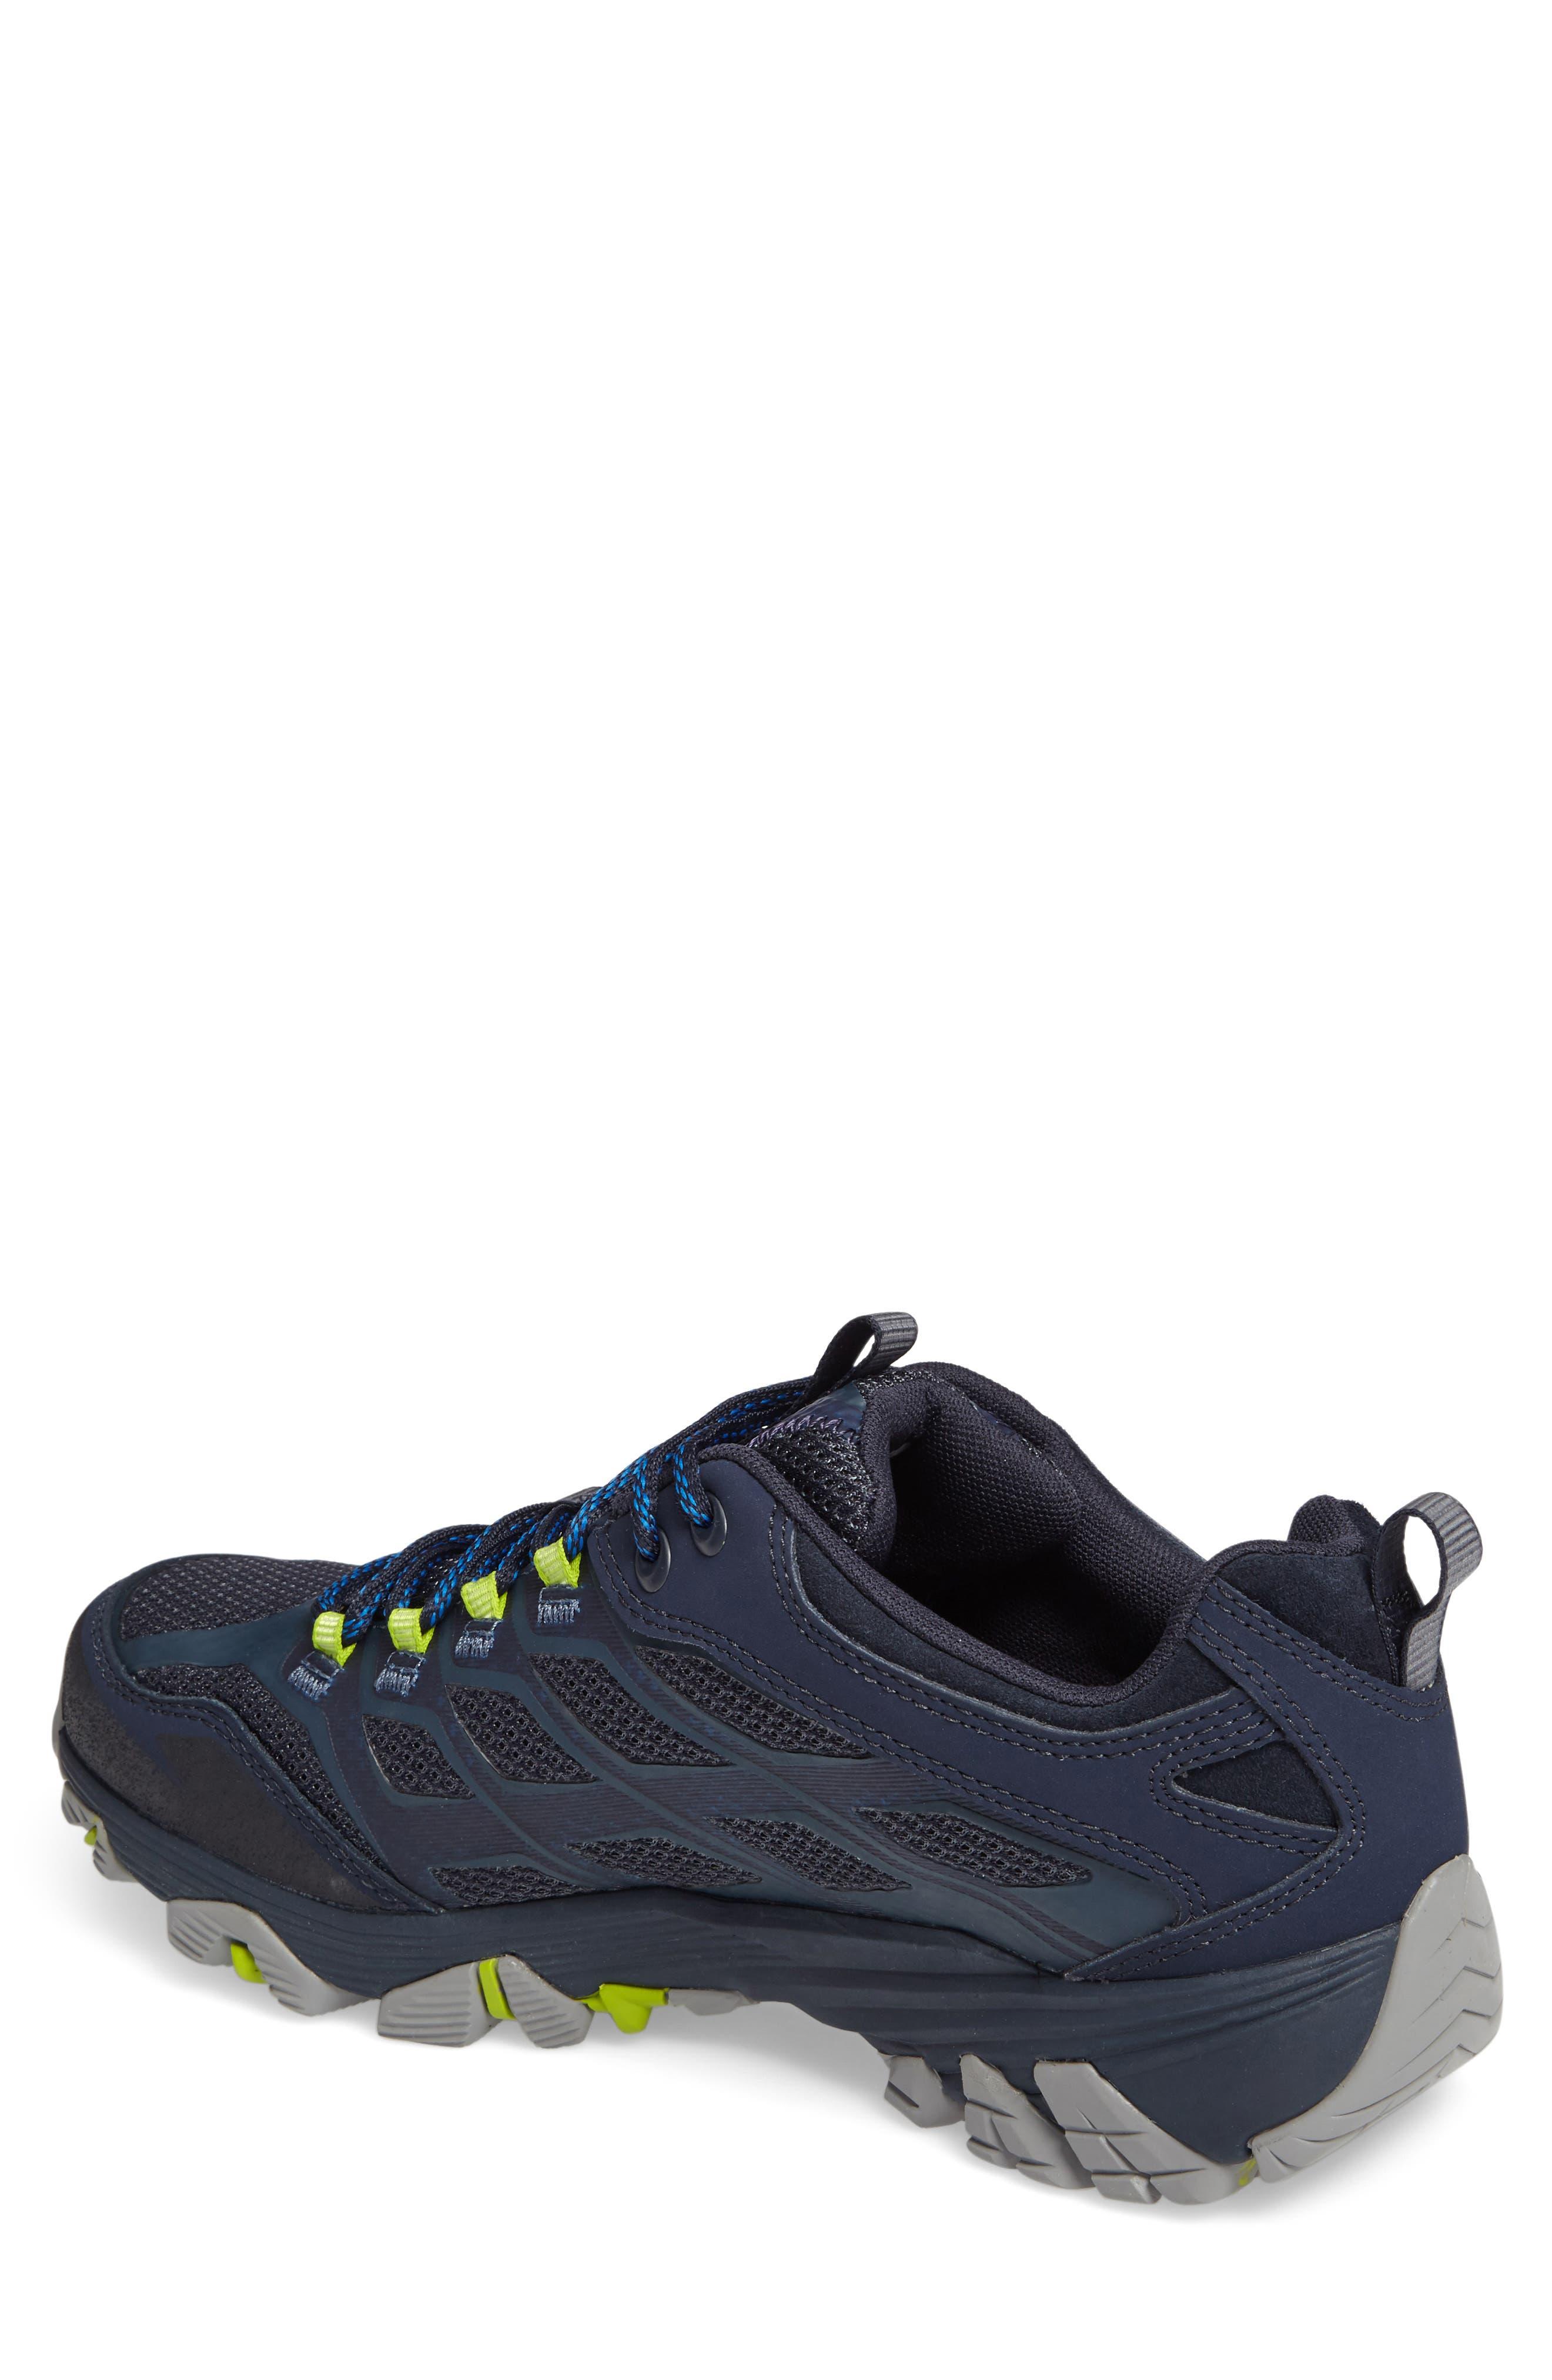 Moab FST Hiking Shoe,                             Alternate thumbnail 4, color,